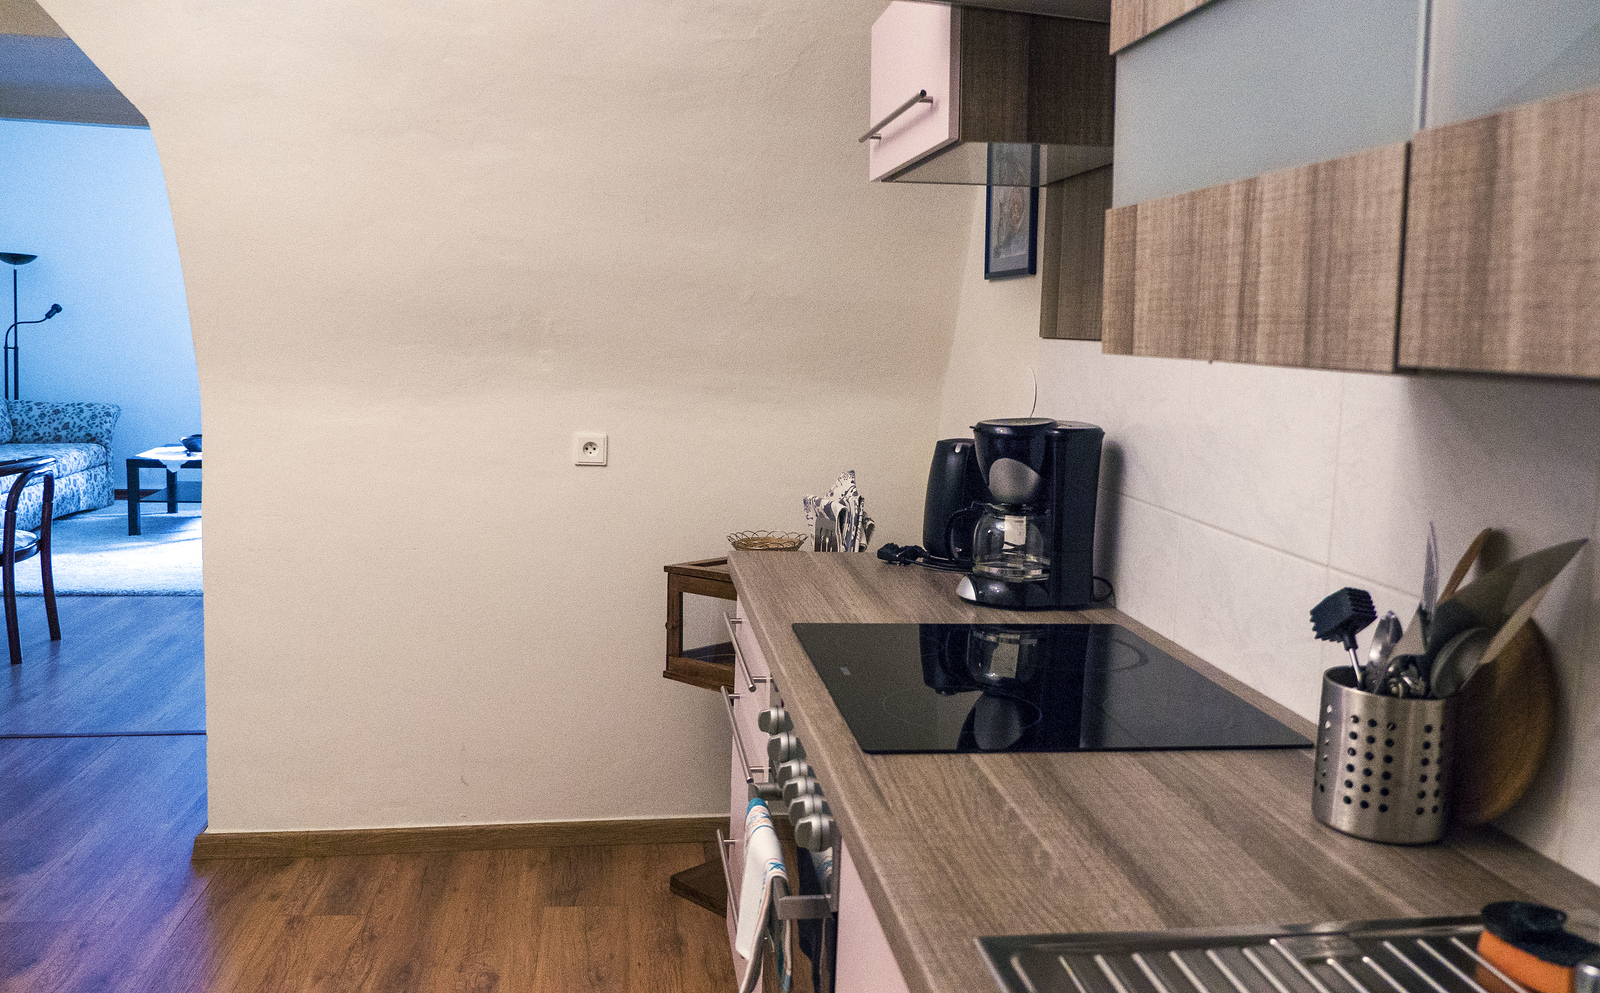 Where to Stay in Cesky Krumlov - Orangerie Apartment